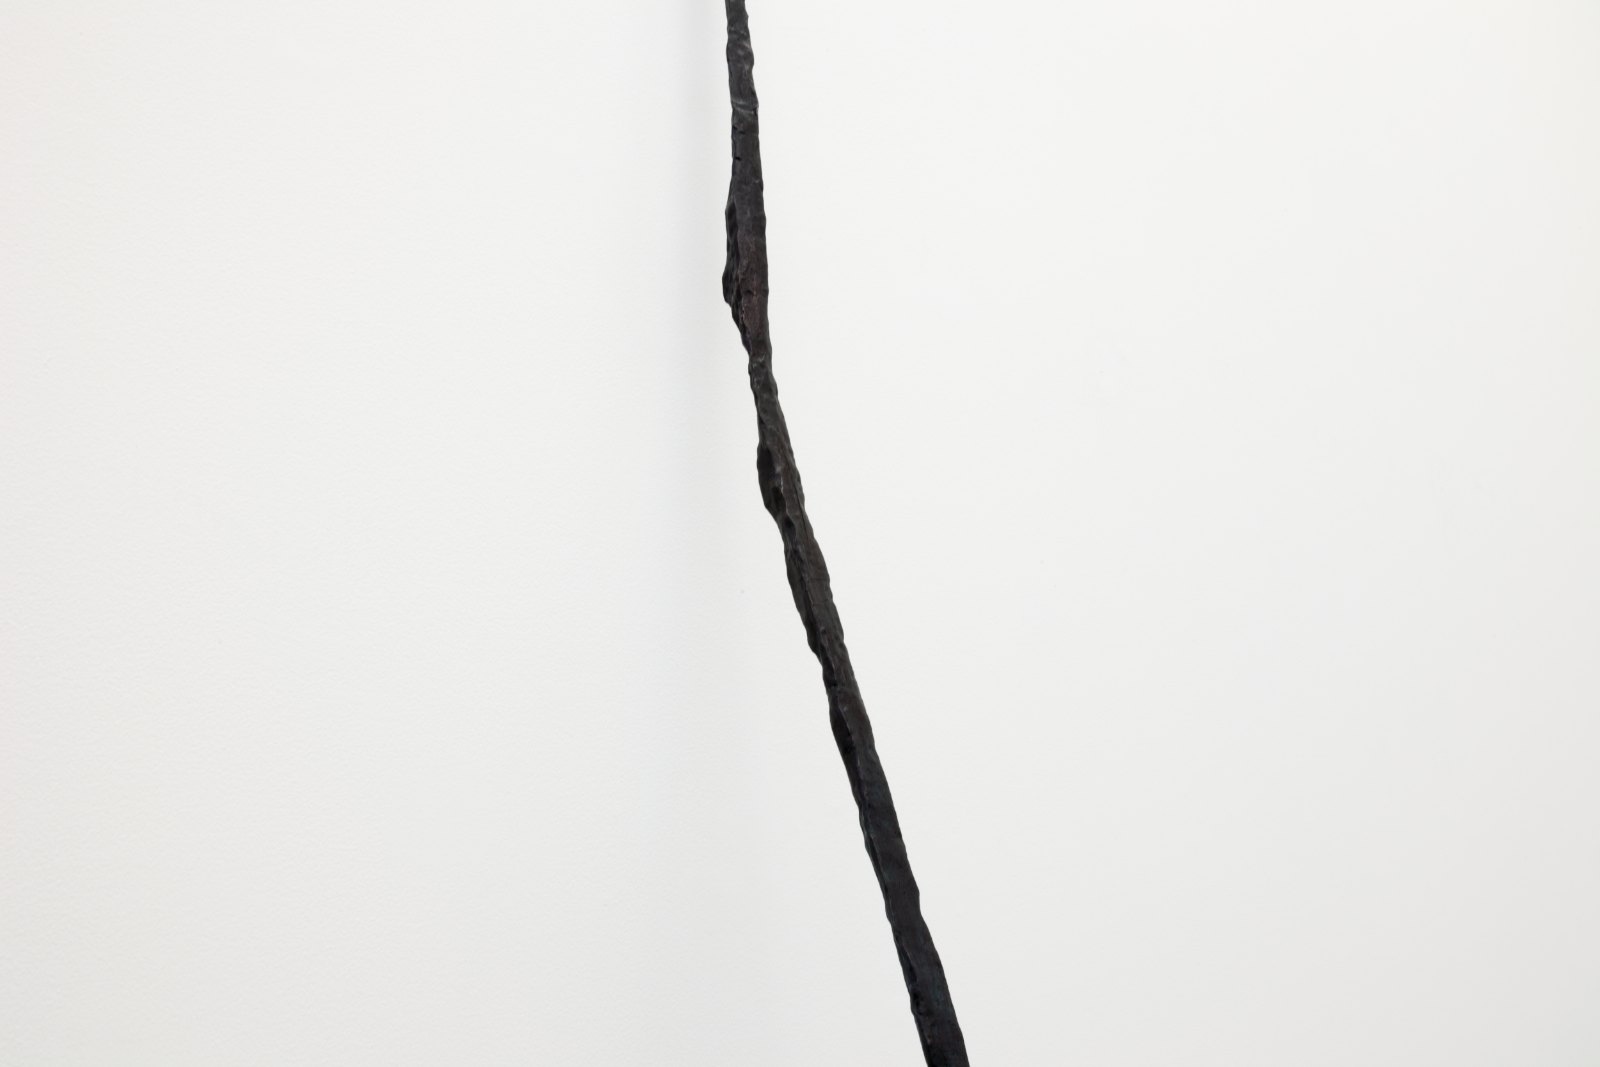 Jan Groth, Sculpture I, 1990, detail